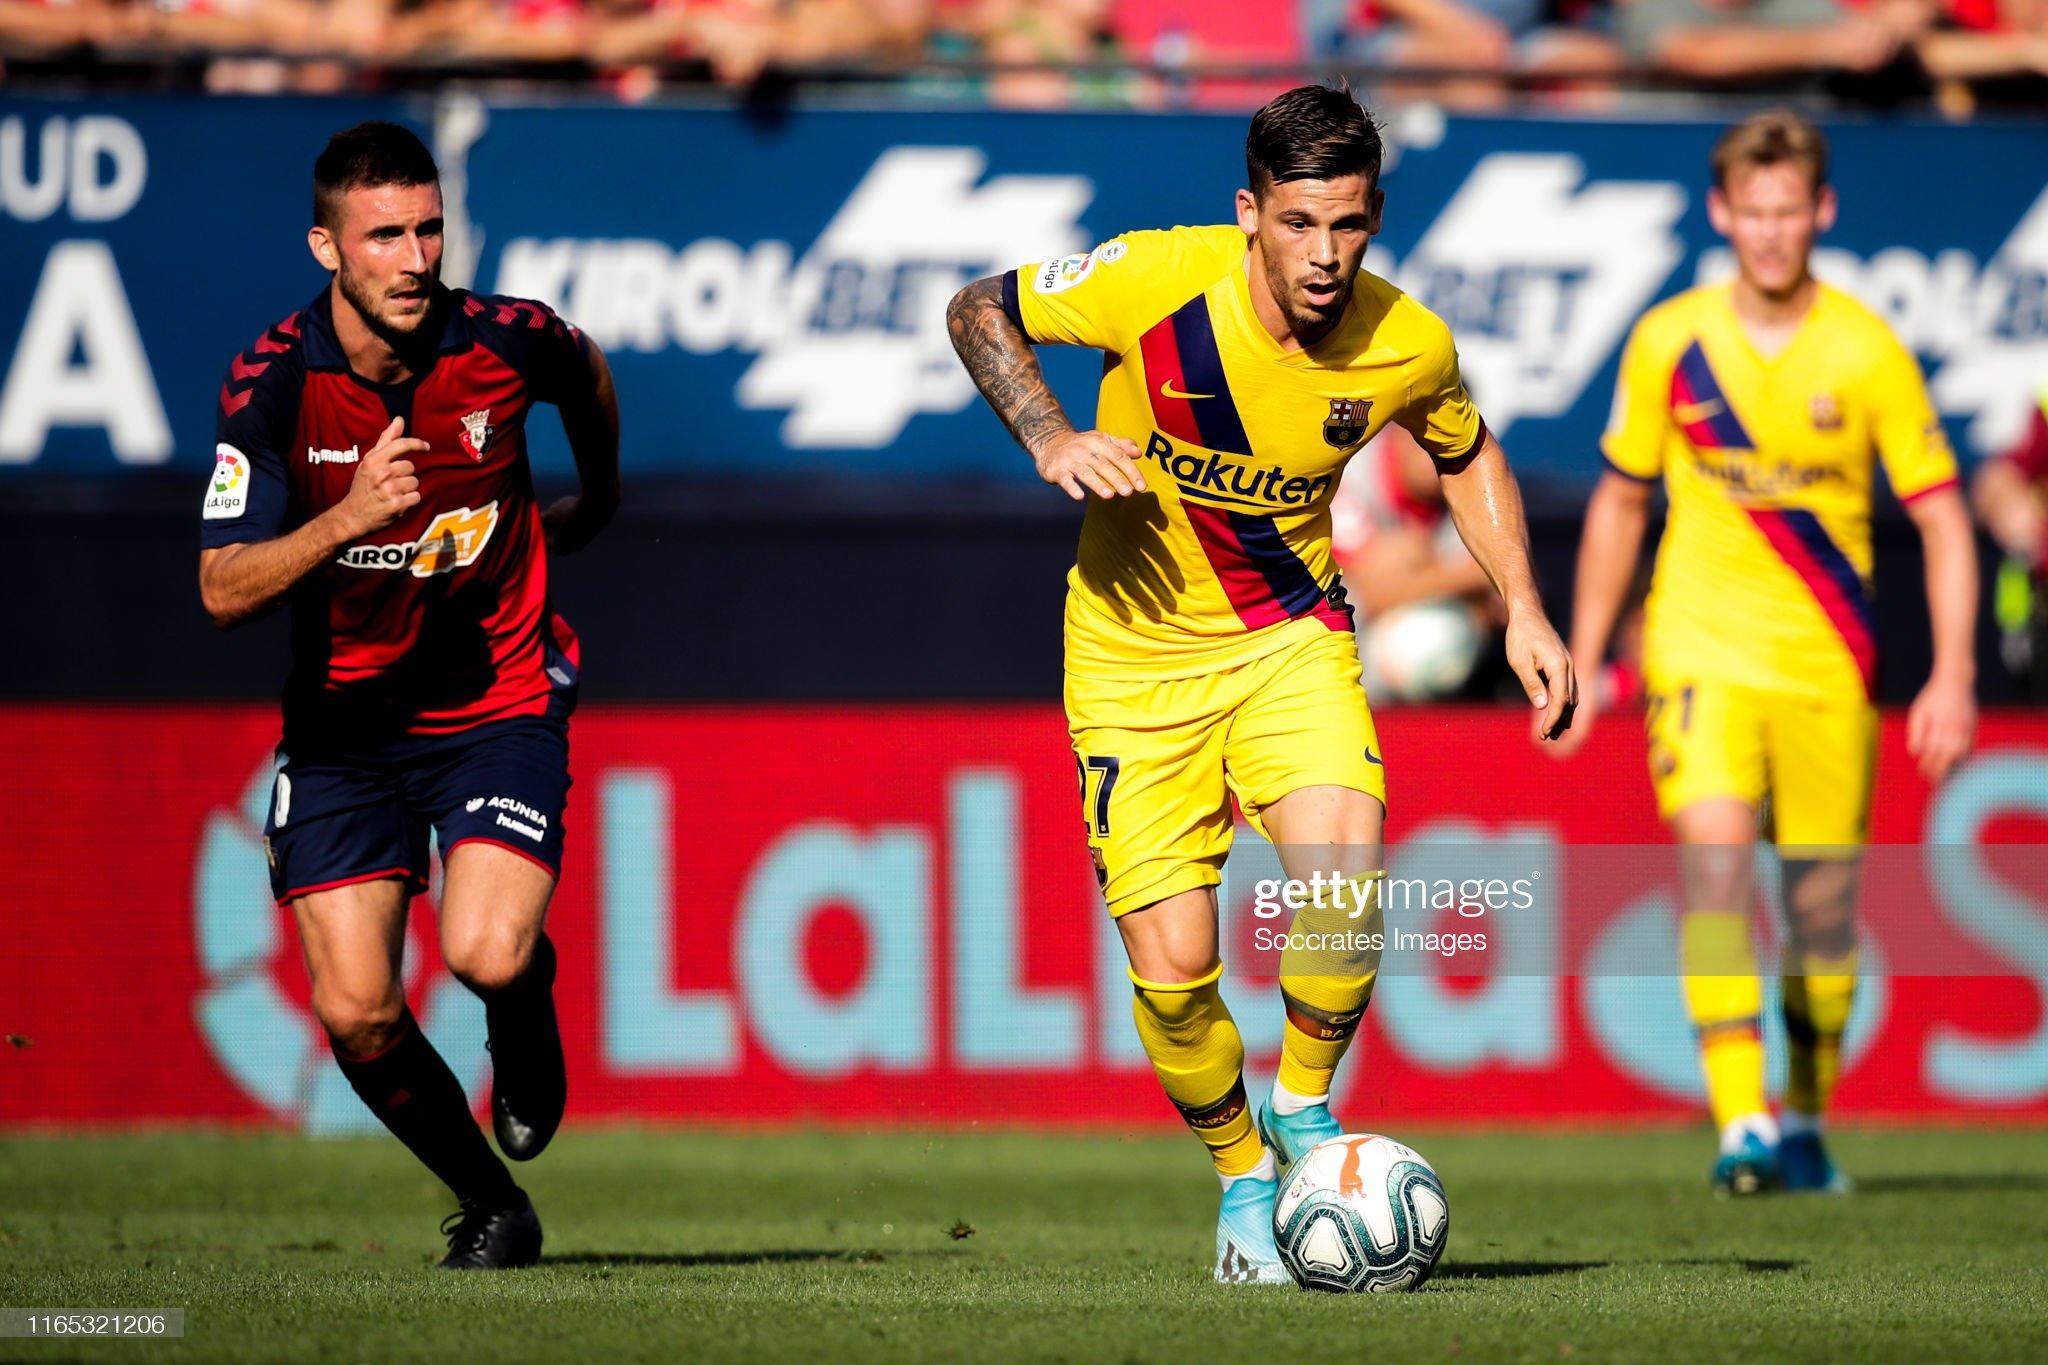 صور مباراة : أوساسونا - برشلونة 2-2 ( 31-08-2019 )  Carles-perez-of-fc-barcelona-during-the-la-liga-santander-match-v-picture-id1165321206?s=2048x2048